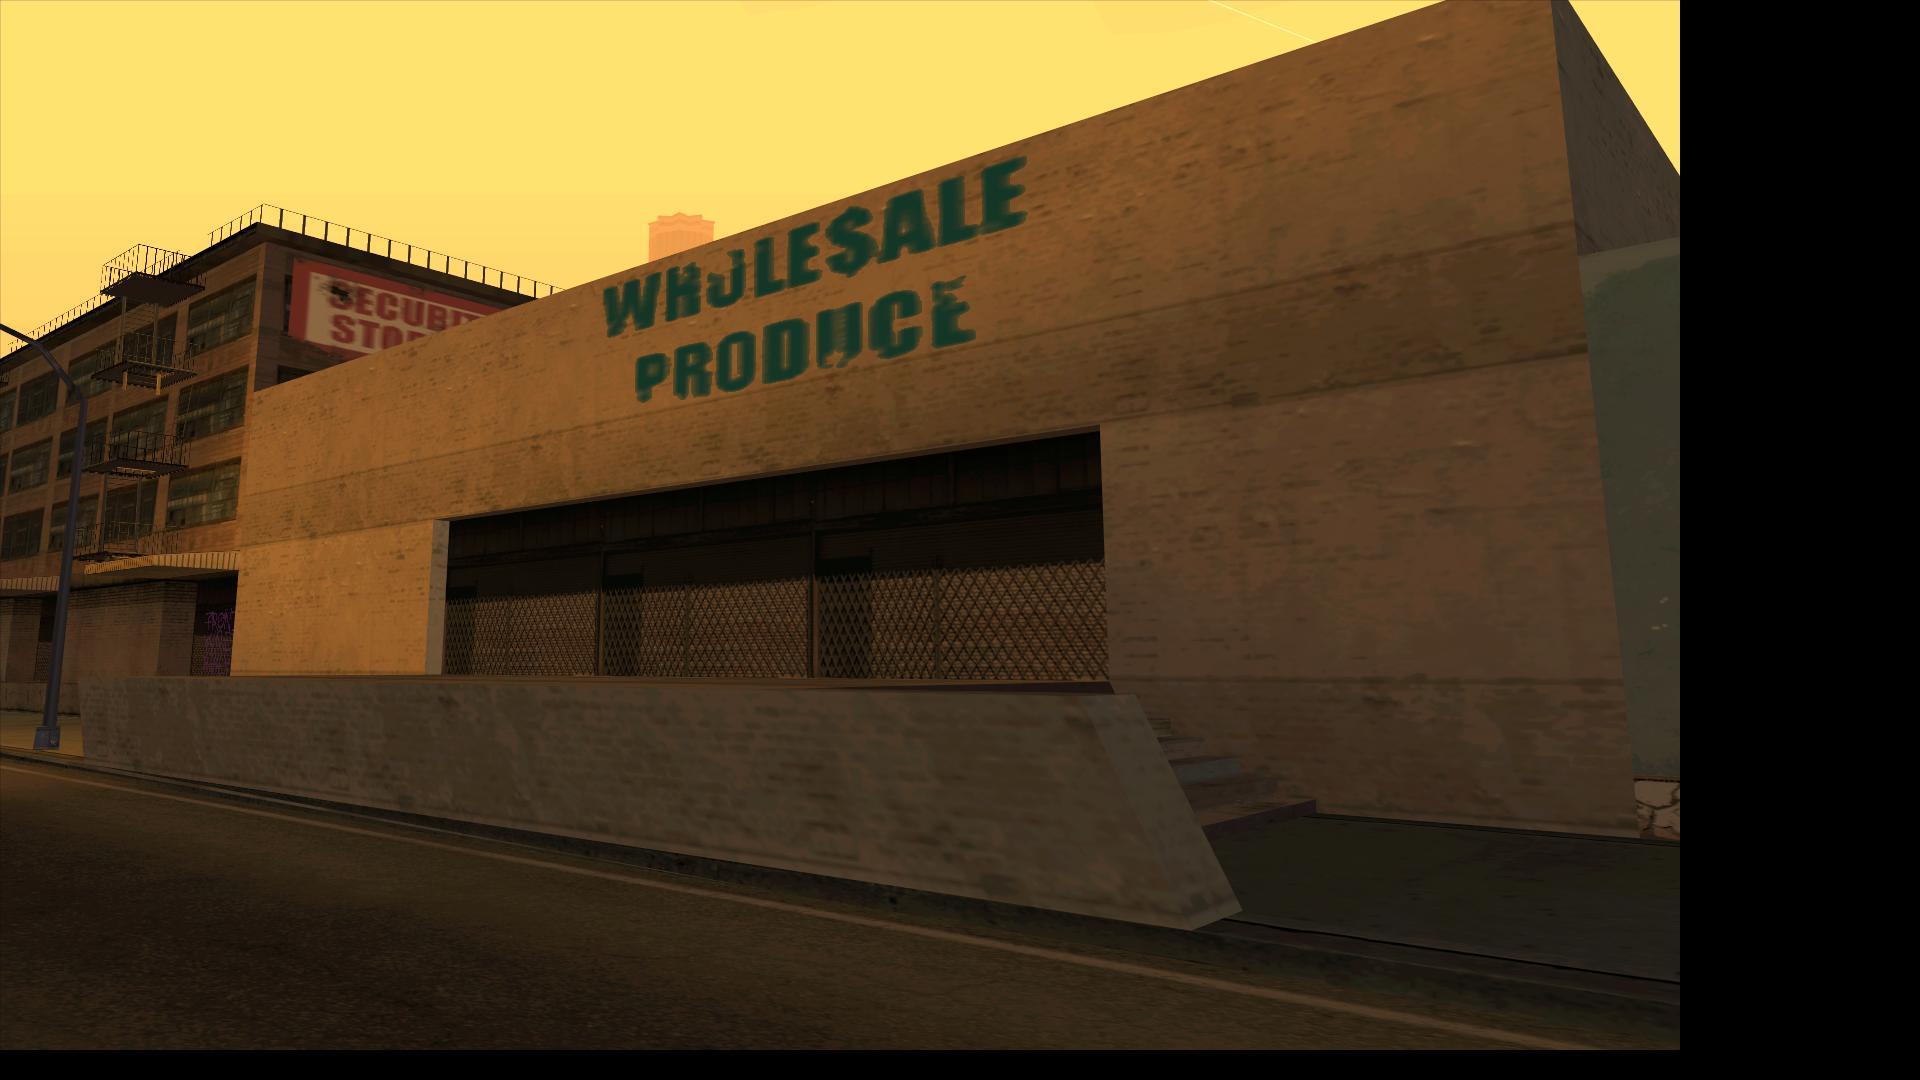 Wholesale Produce